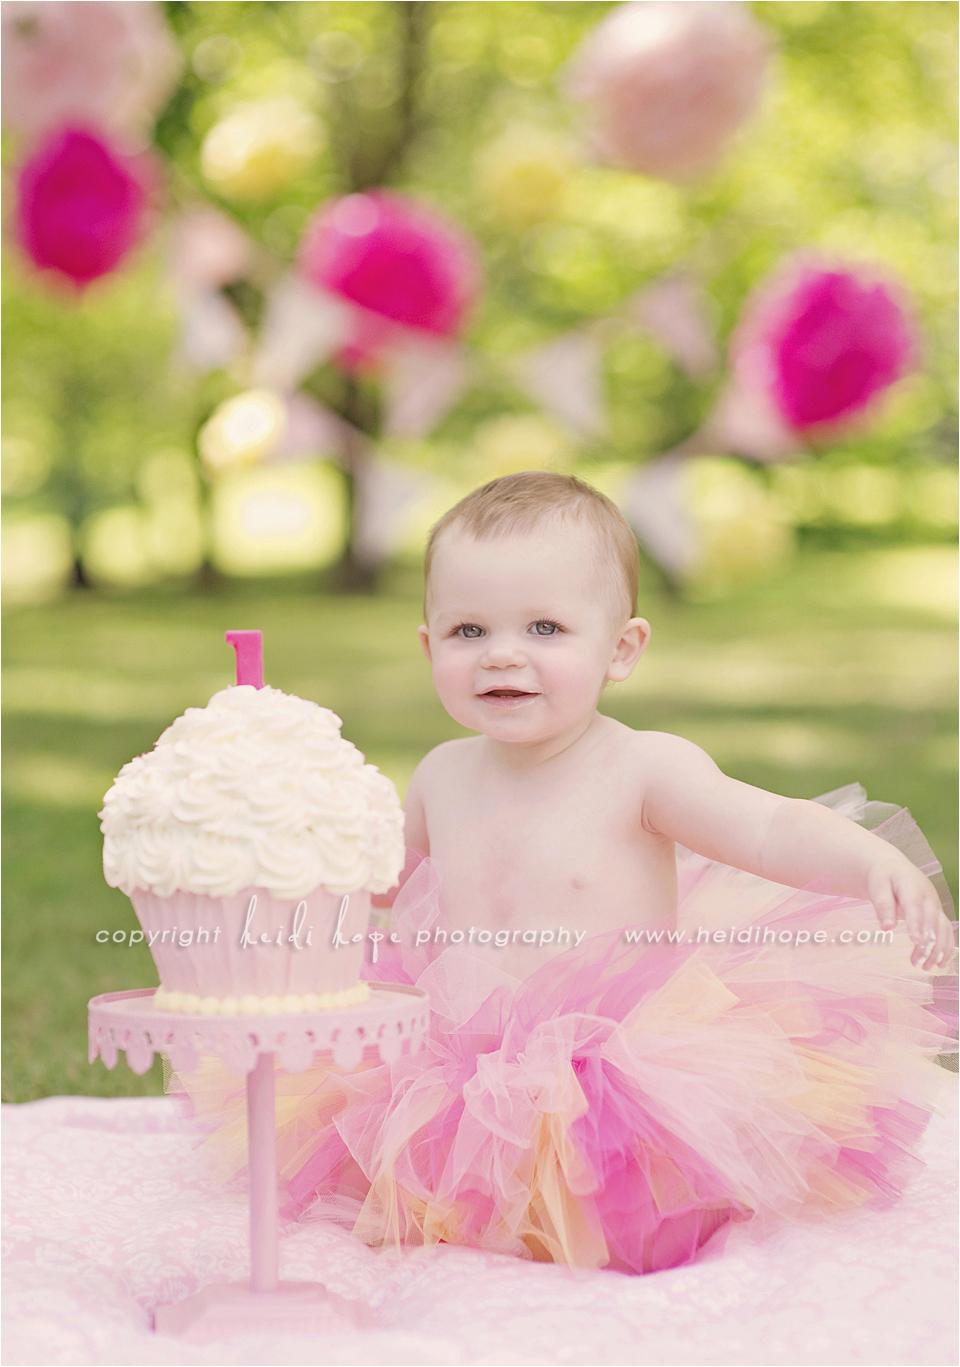 baby k turns 1 year old rhode island first birthday cake smash photographer